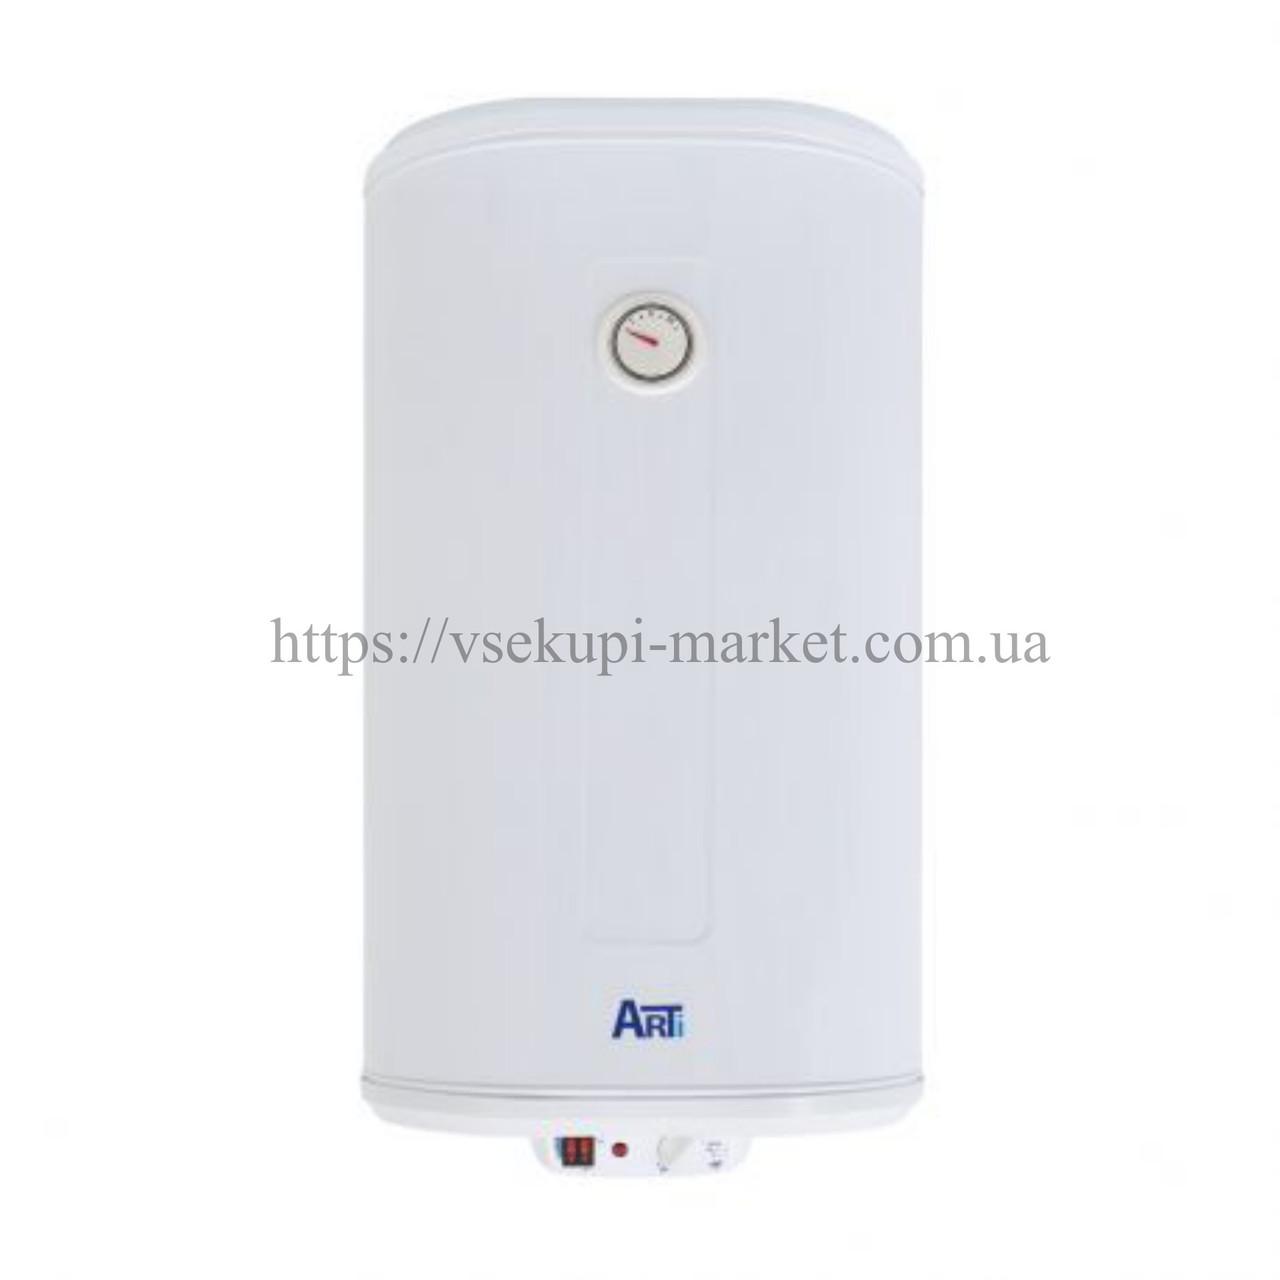 Бойлер Arti WH Cube Dry 120L/2